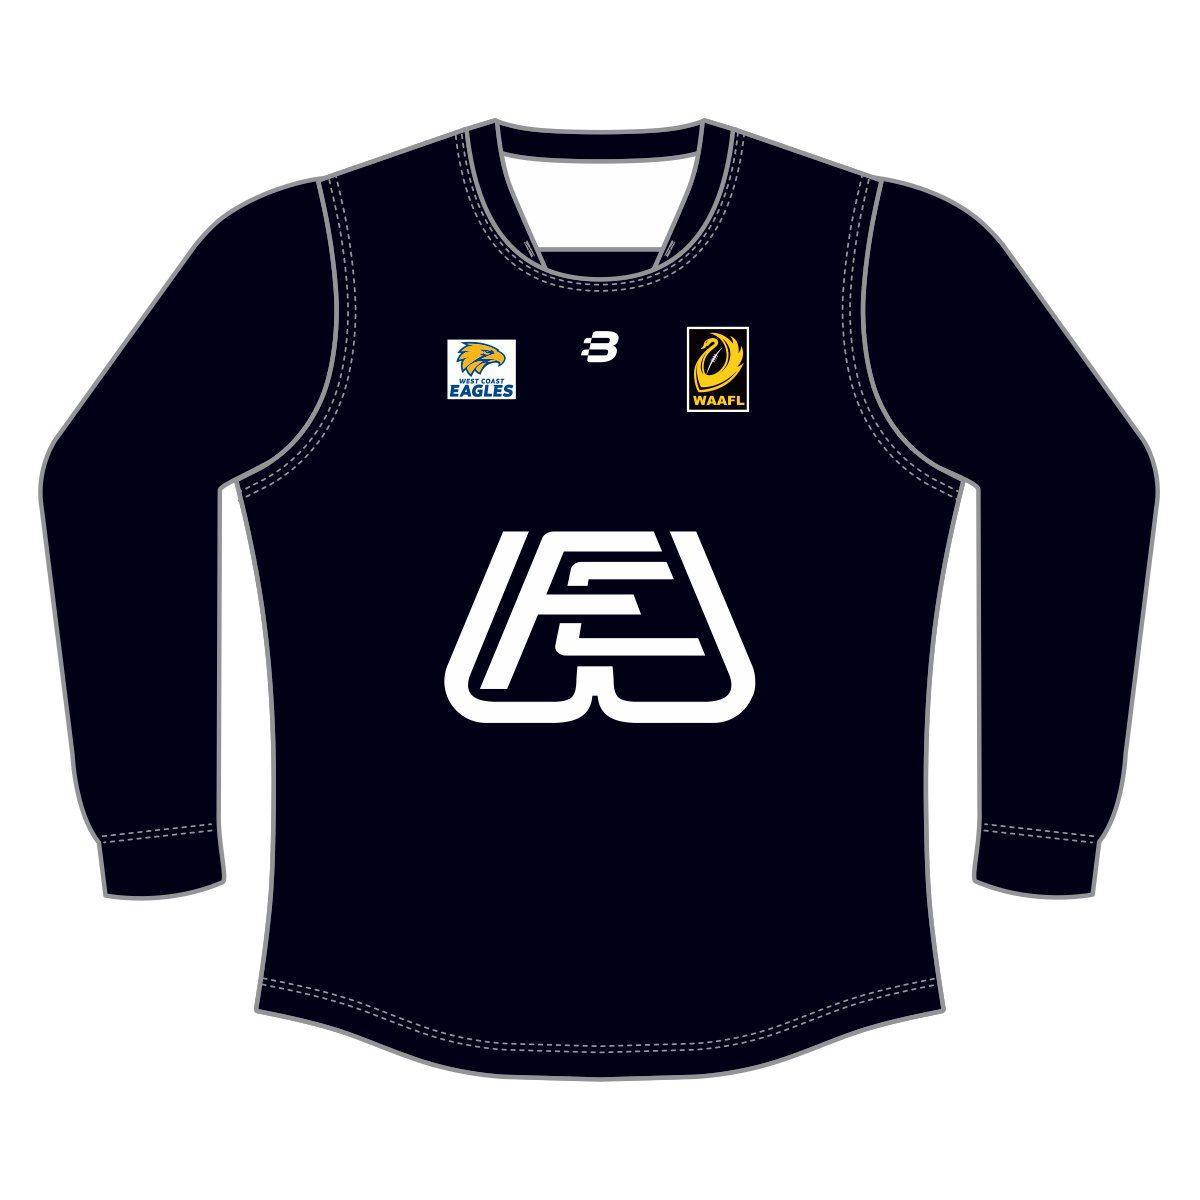 Willetton-Football-Club-Guernsey-LS-Colts-VL68800-Front-1-600x600 2x.jpg ... a7b3badfb